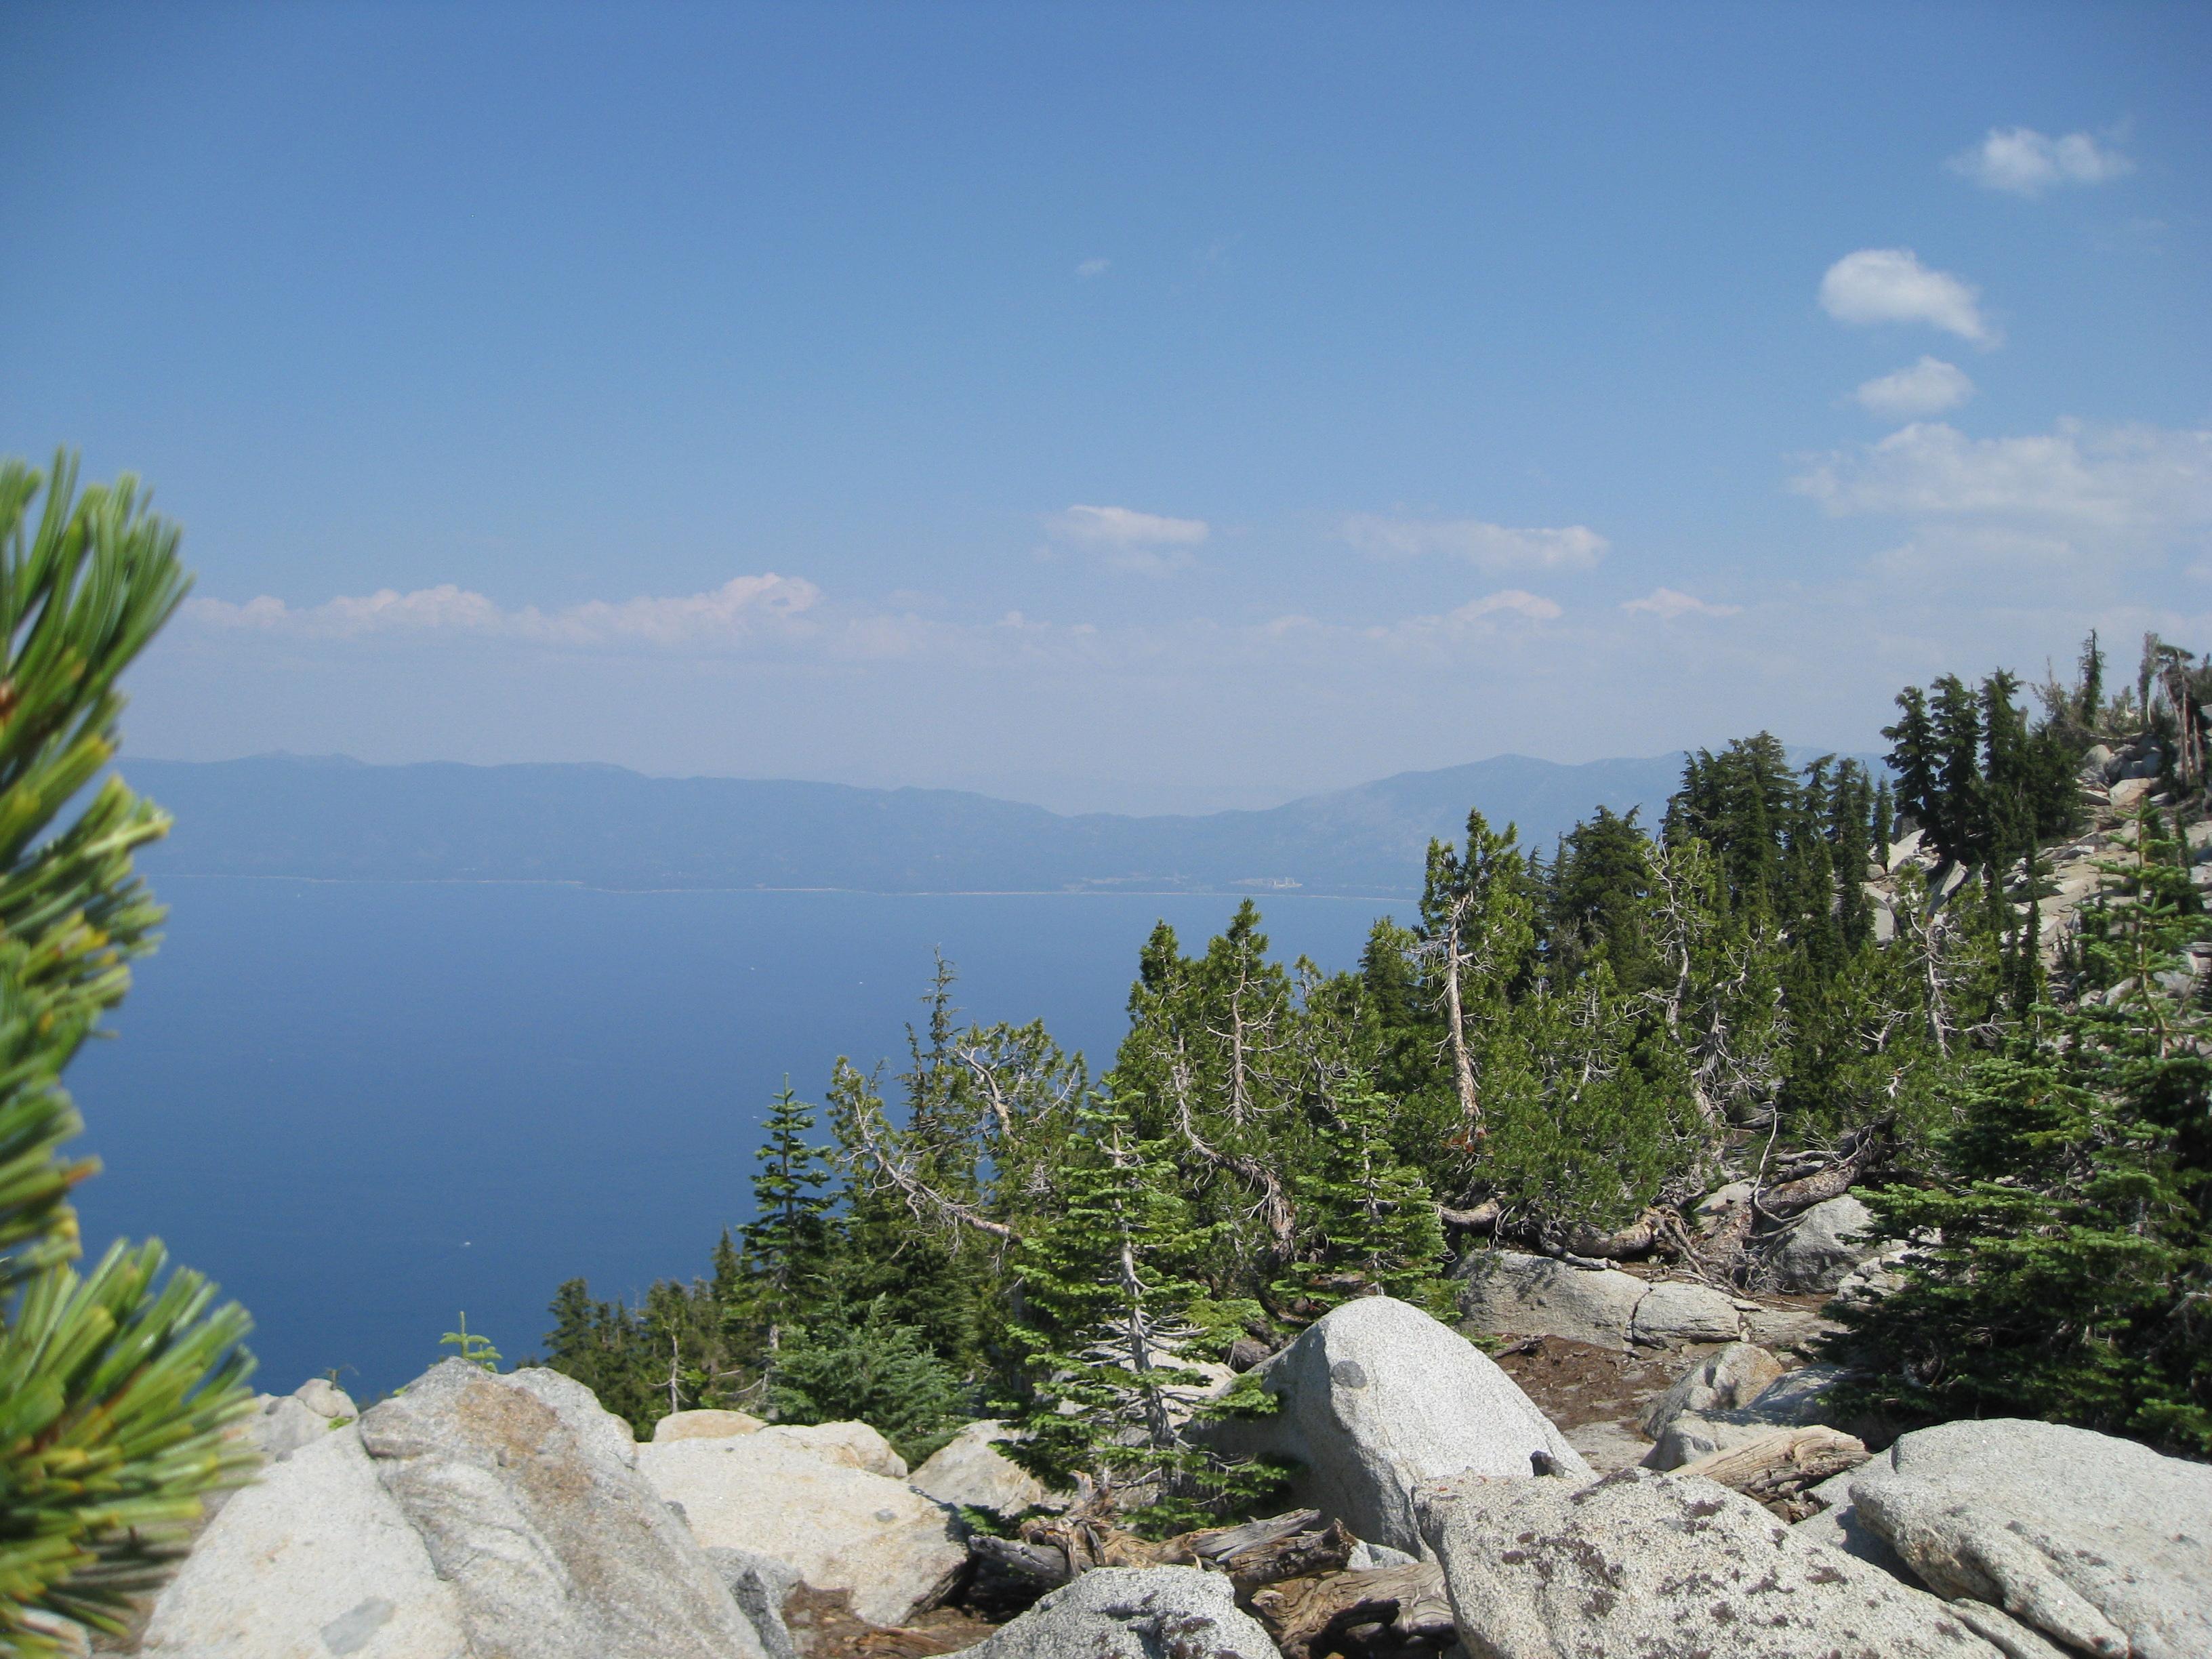 conifers surrounding lake tahoe